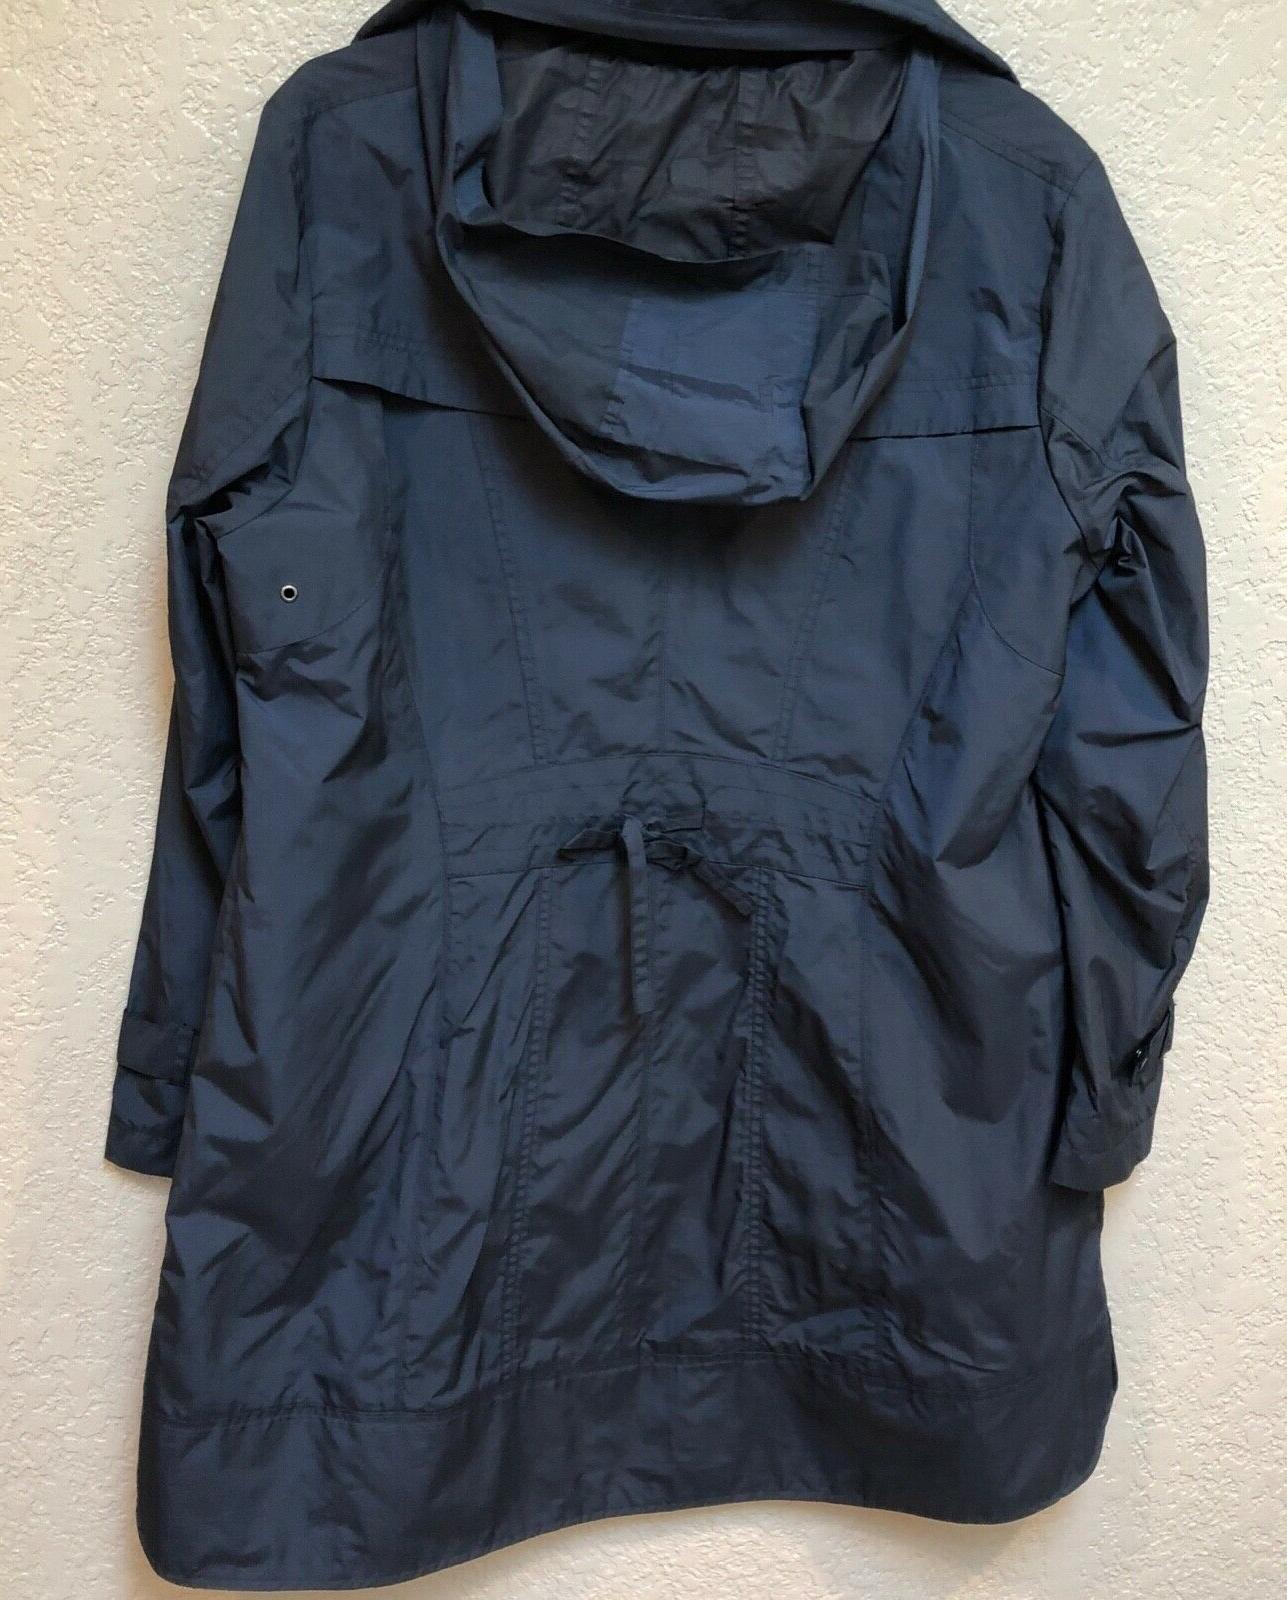 Cole Navy blue raincoat. length. Sz woman's XL